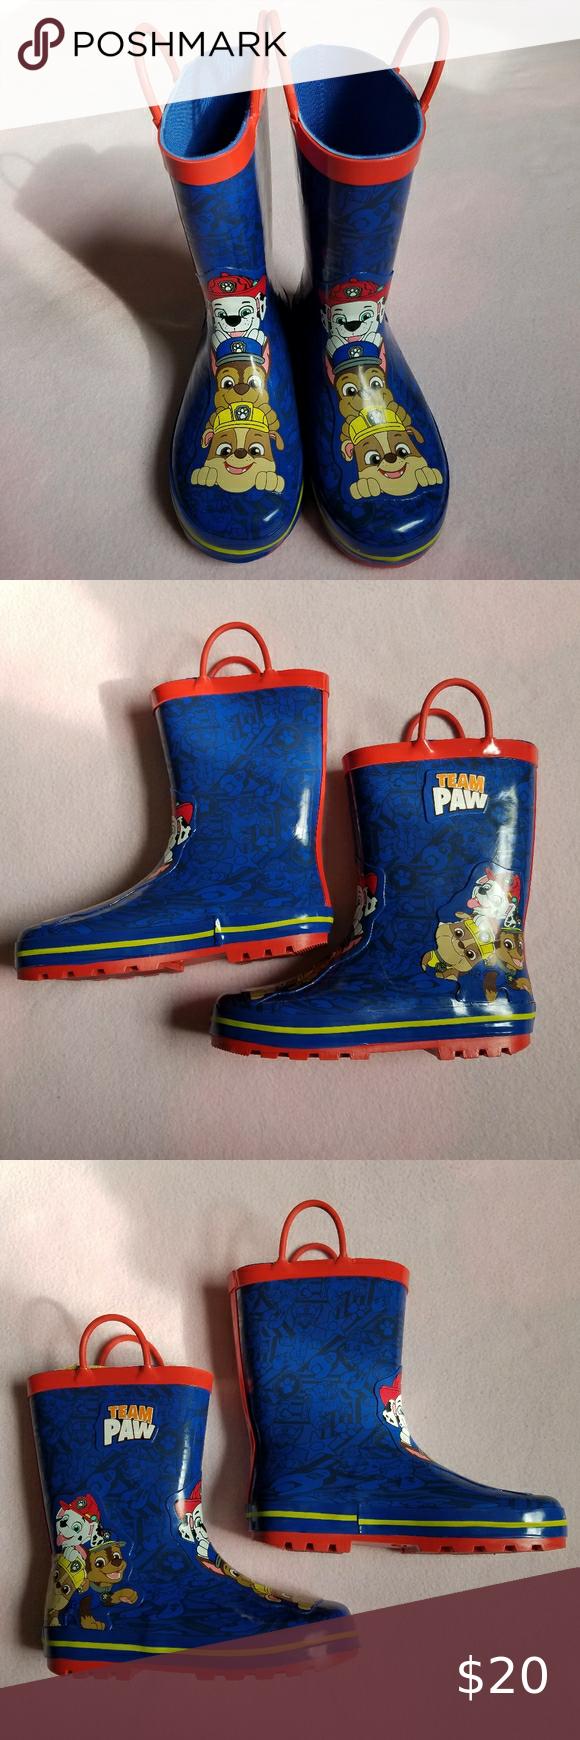 Paw Patrol Rain Boots - 13/1 Little